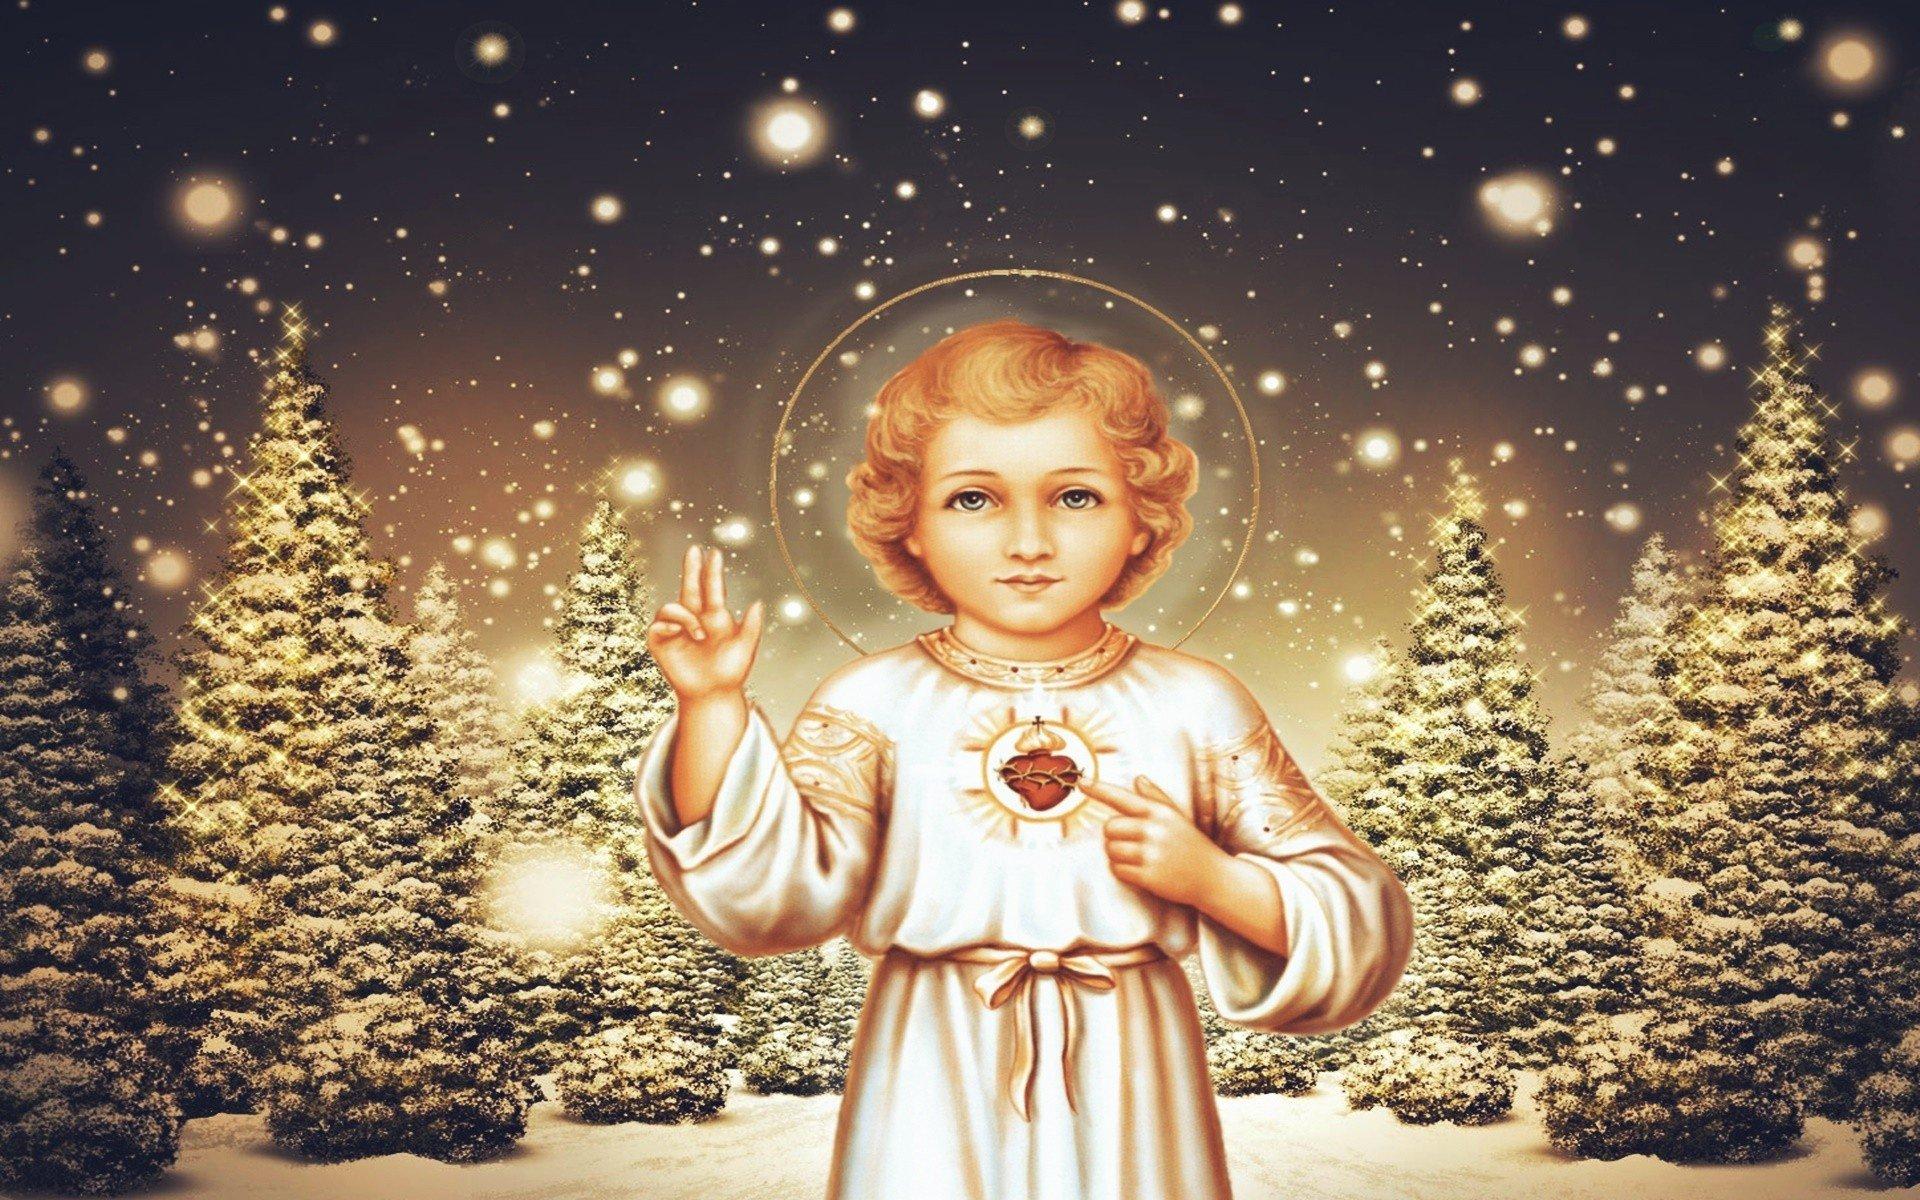 children  jesus christ  christmas  pine trees  lights